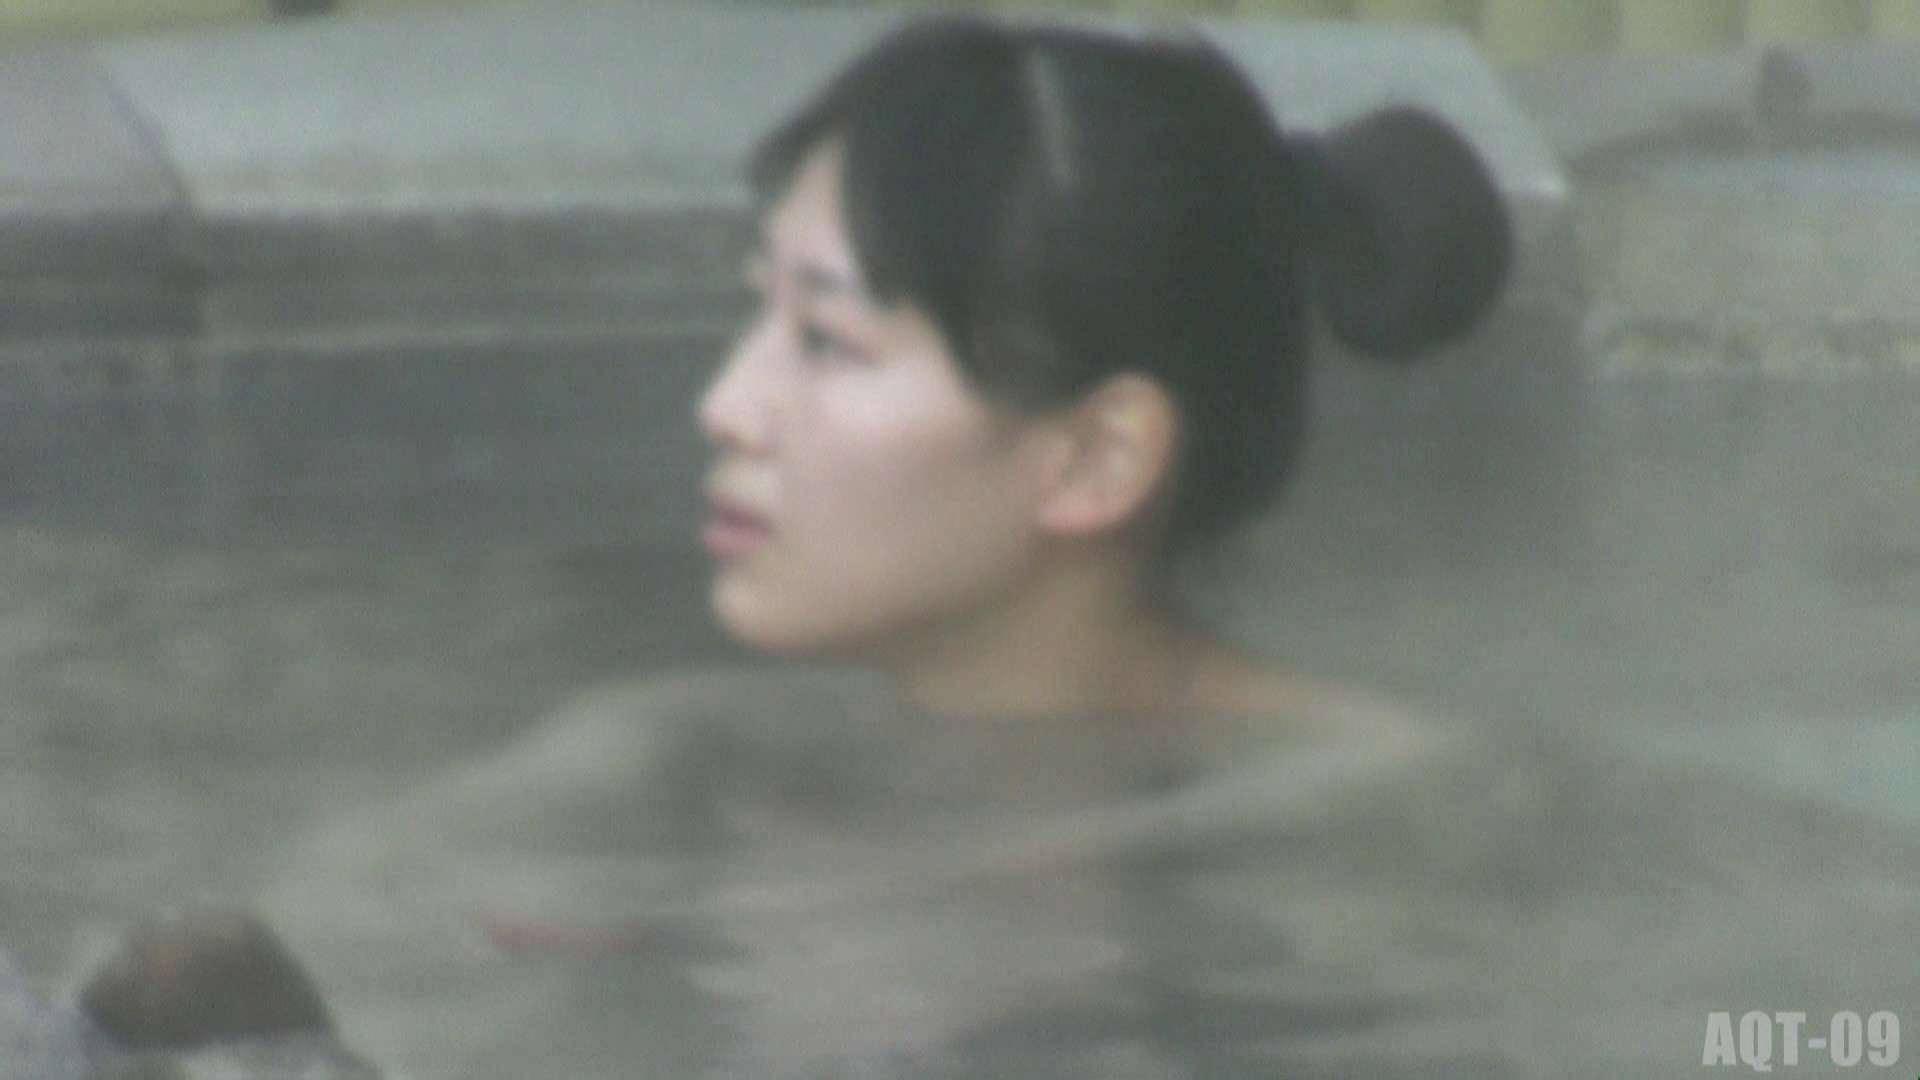 Aquaな露天風呂Vol.785 露天風呂編  110PIX 6